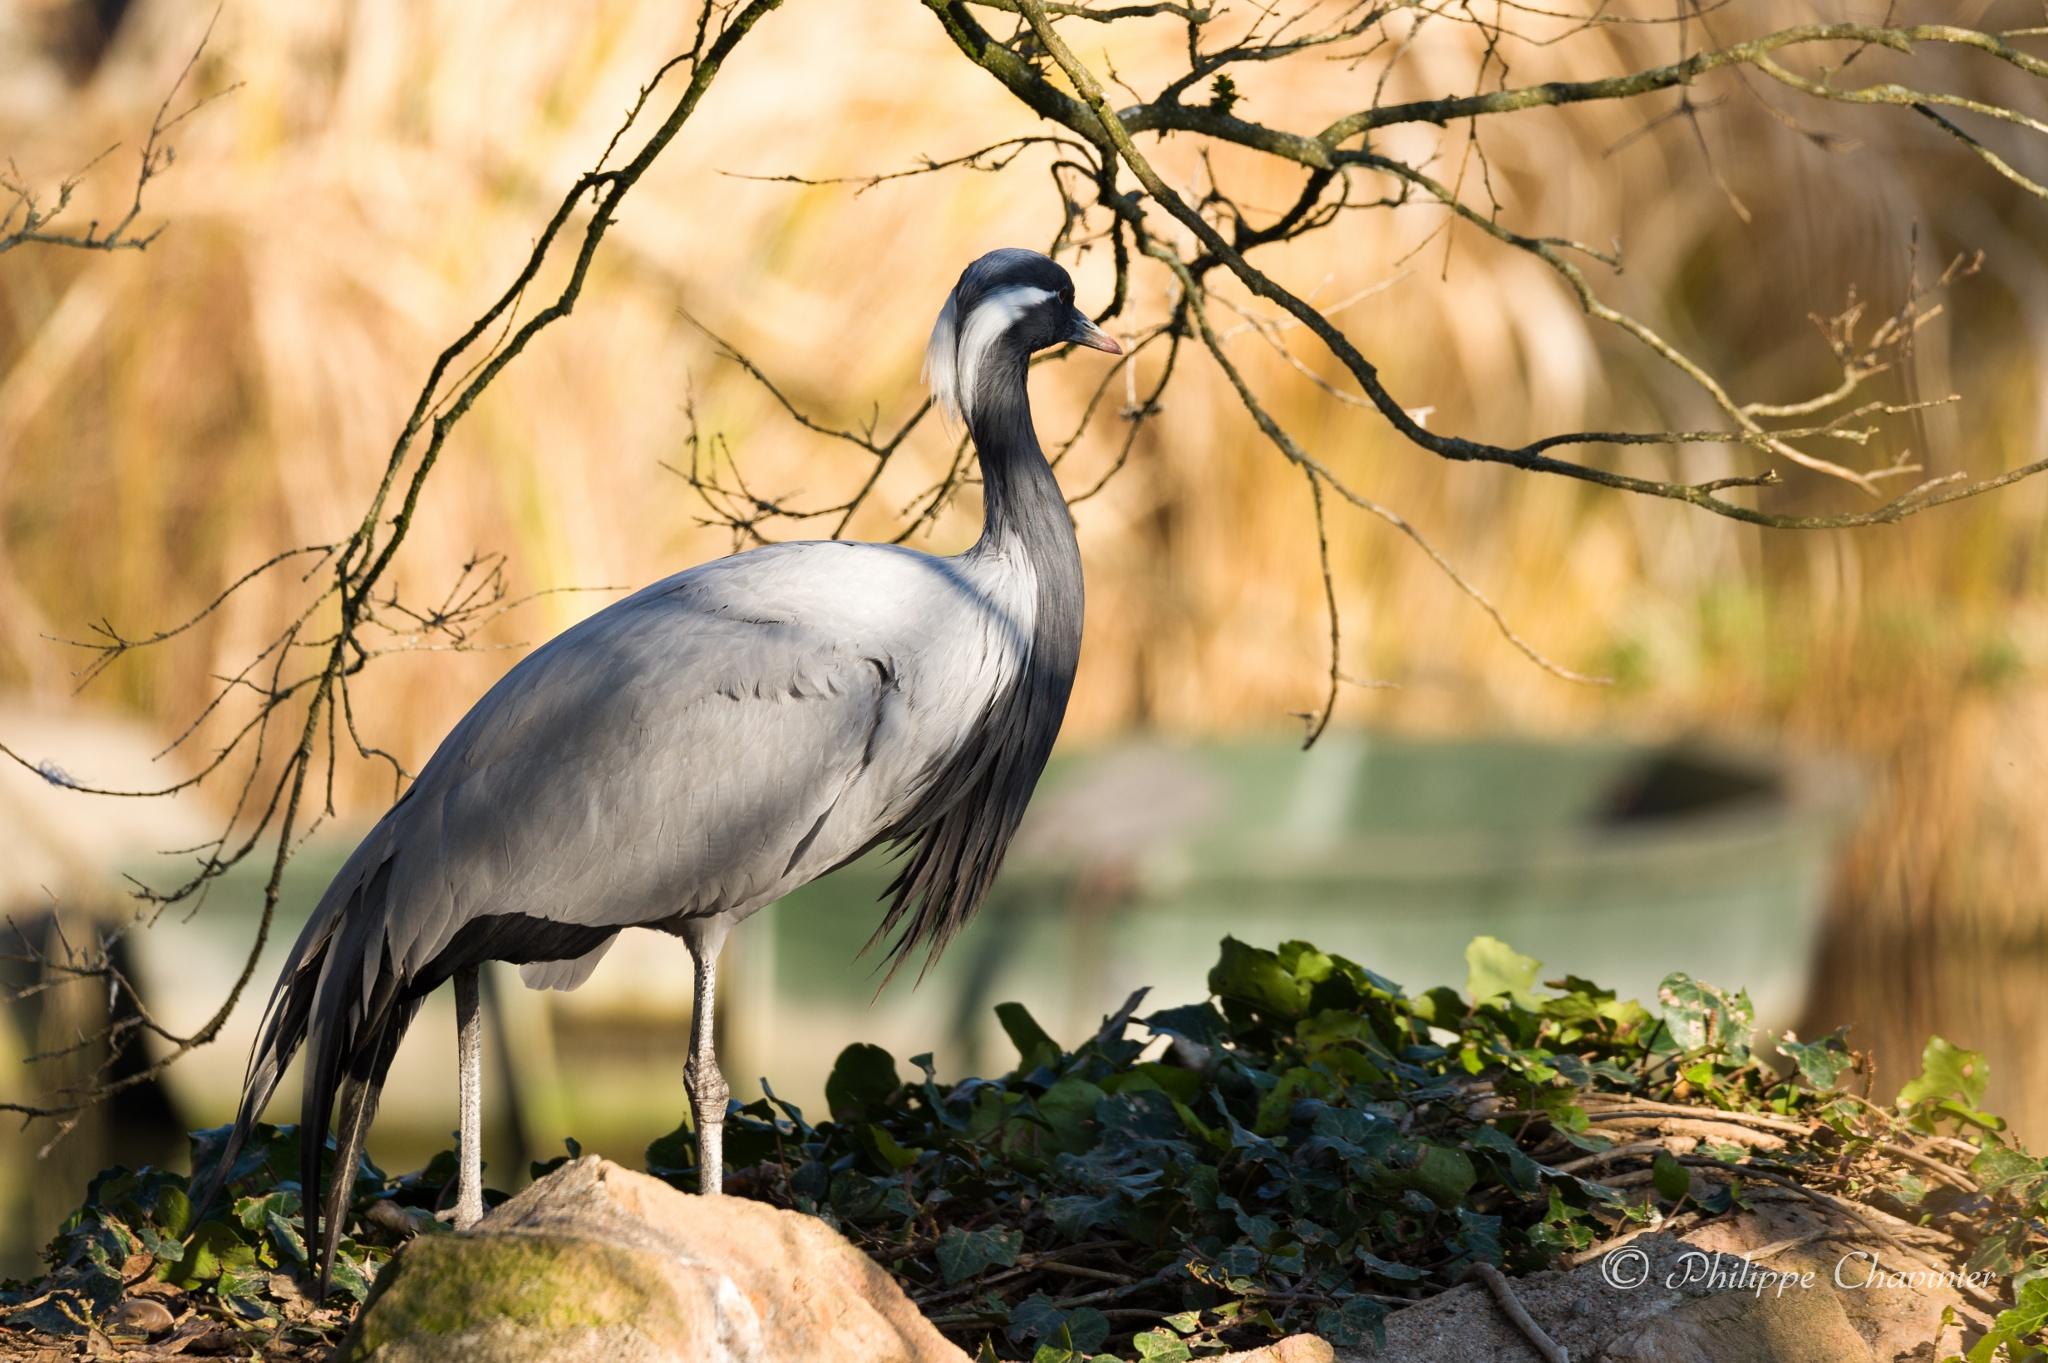 Demoiselle crane by Philippe Chavinier